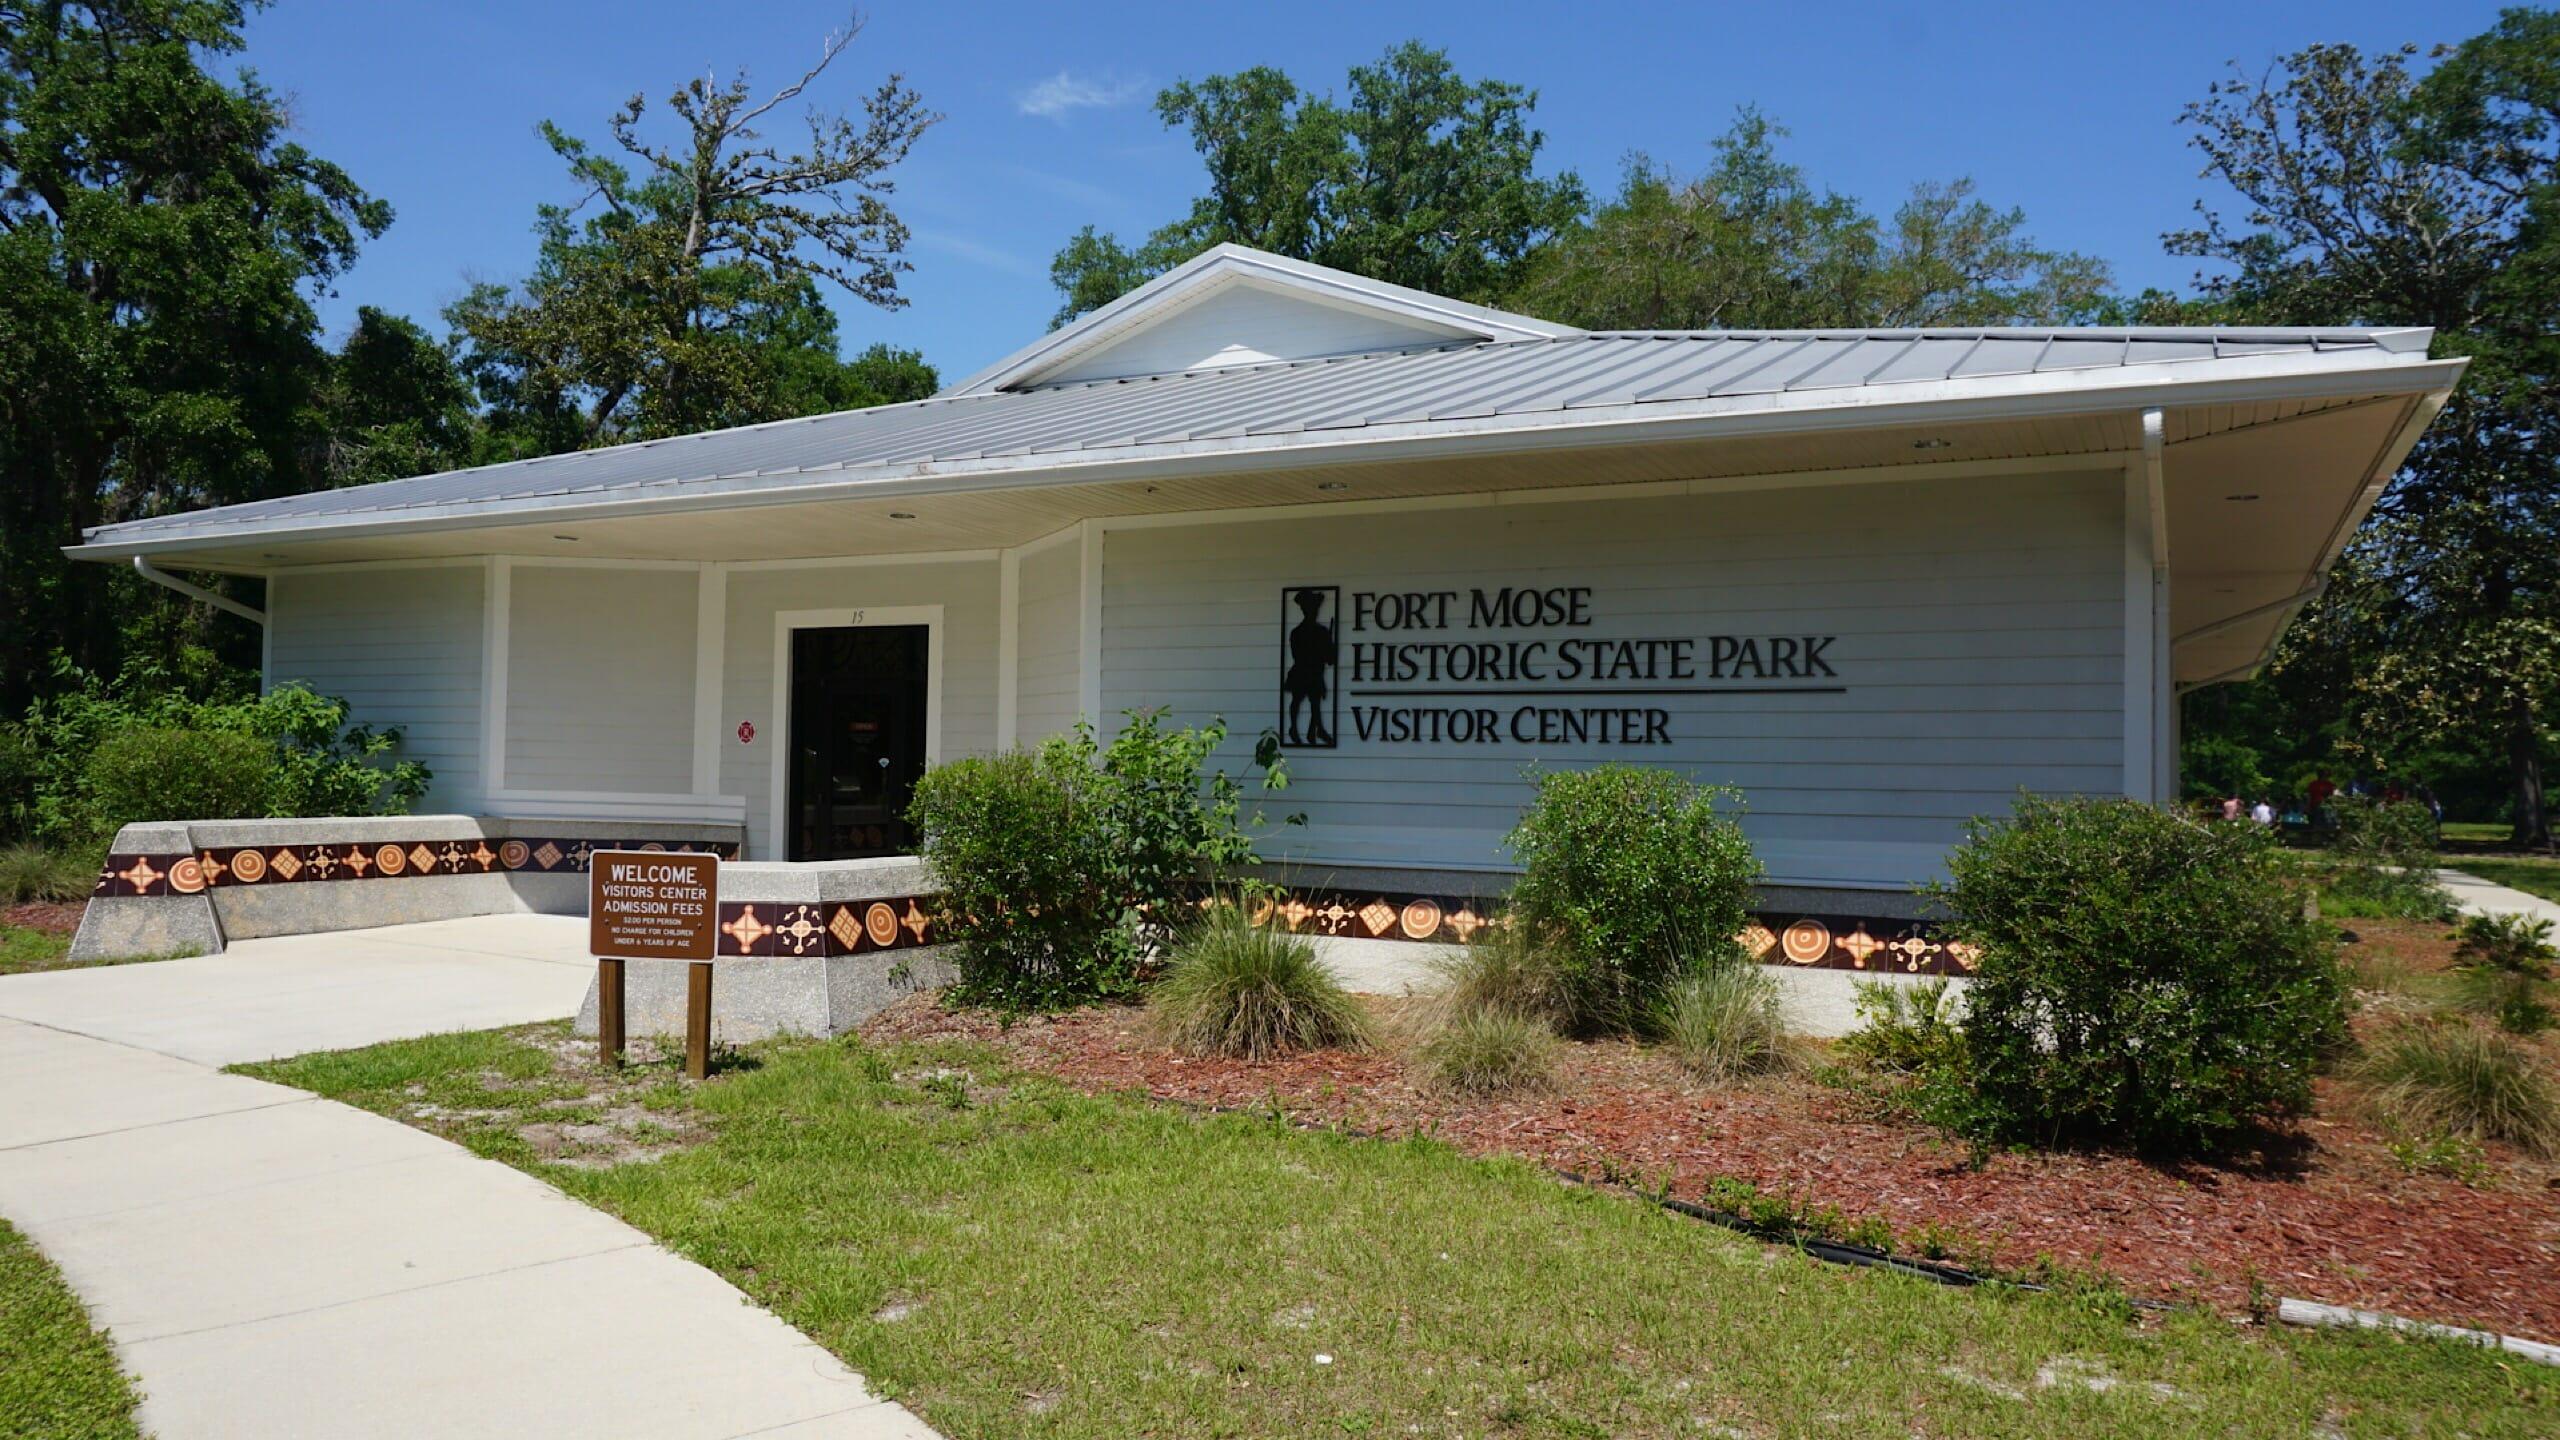 Fort Mose Visitor Center